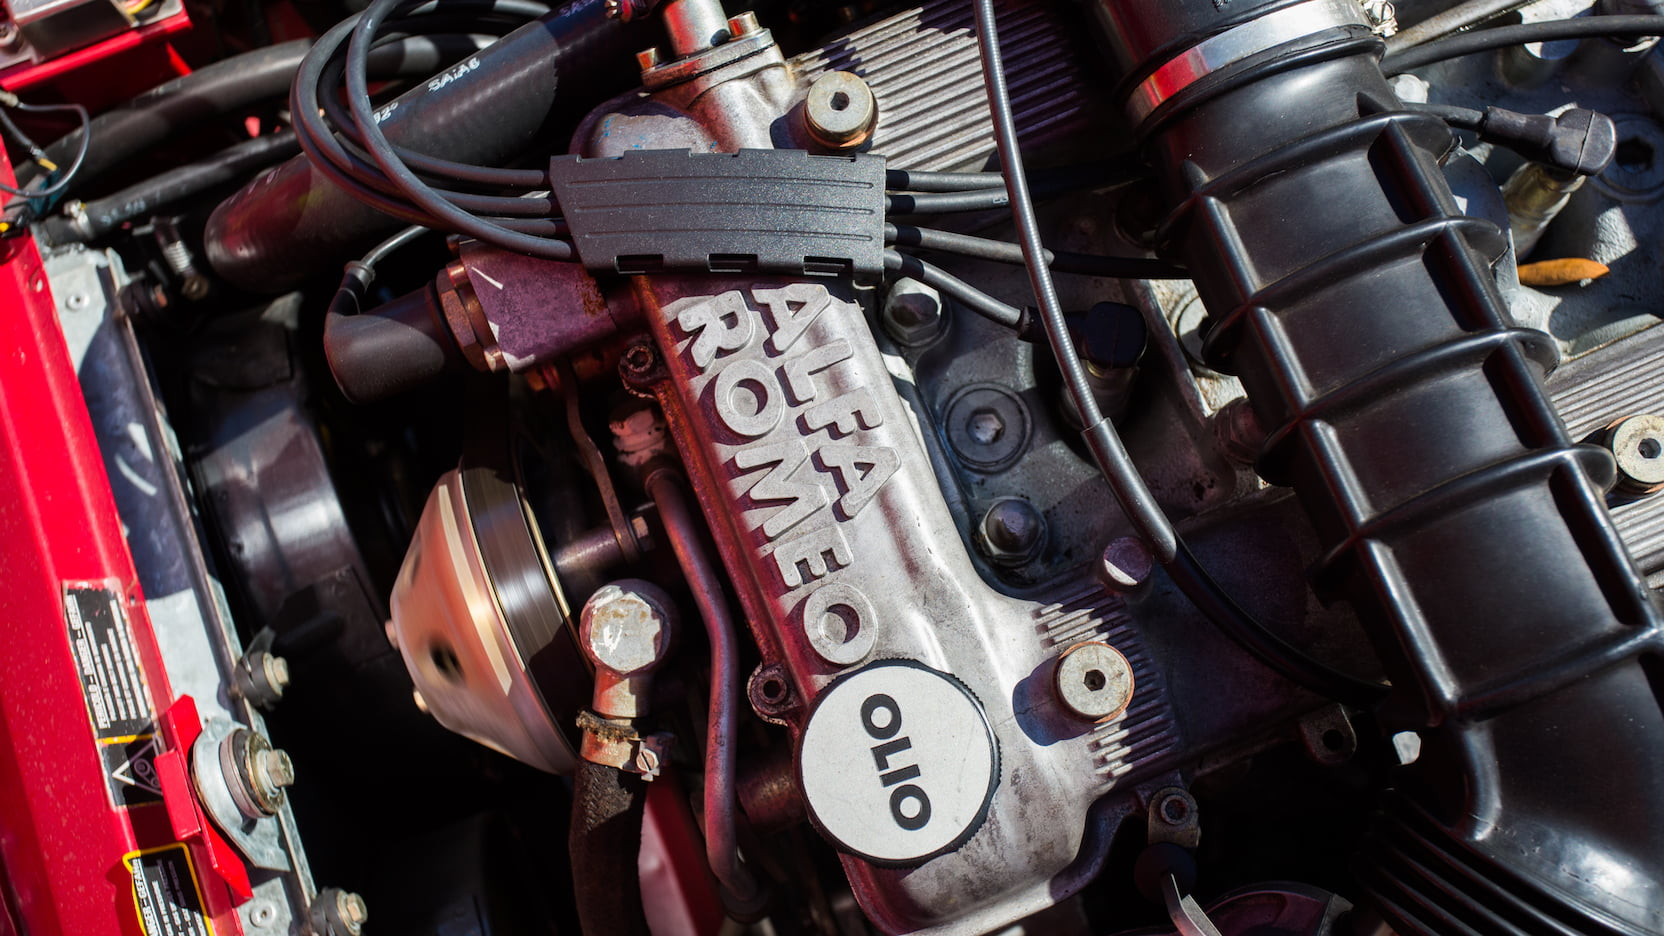 1992 Alfa Romeo Spider engine detail